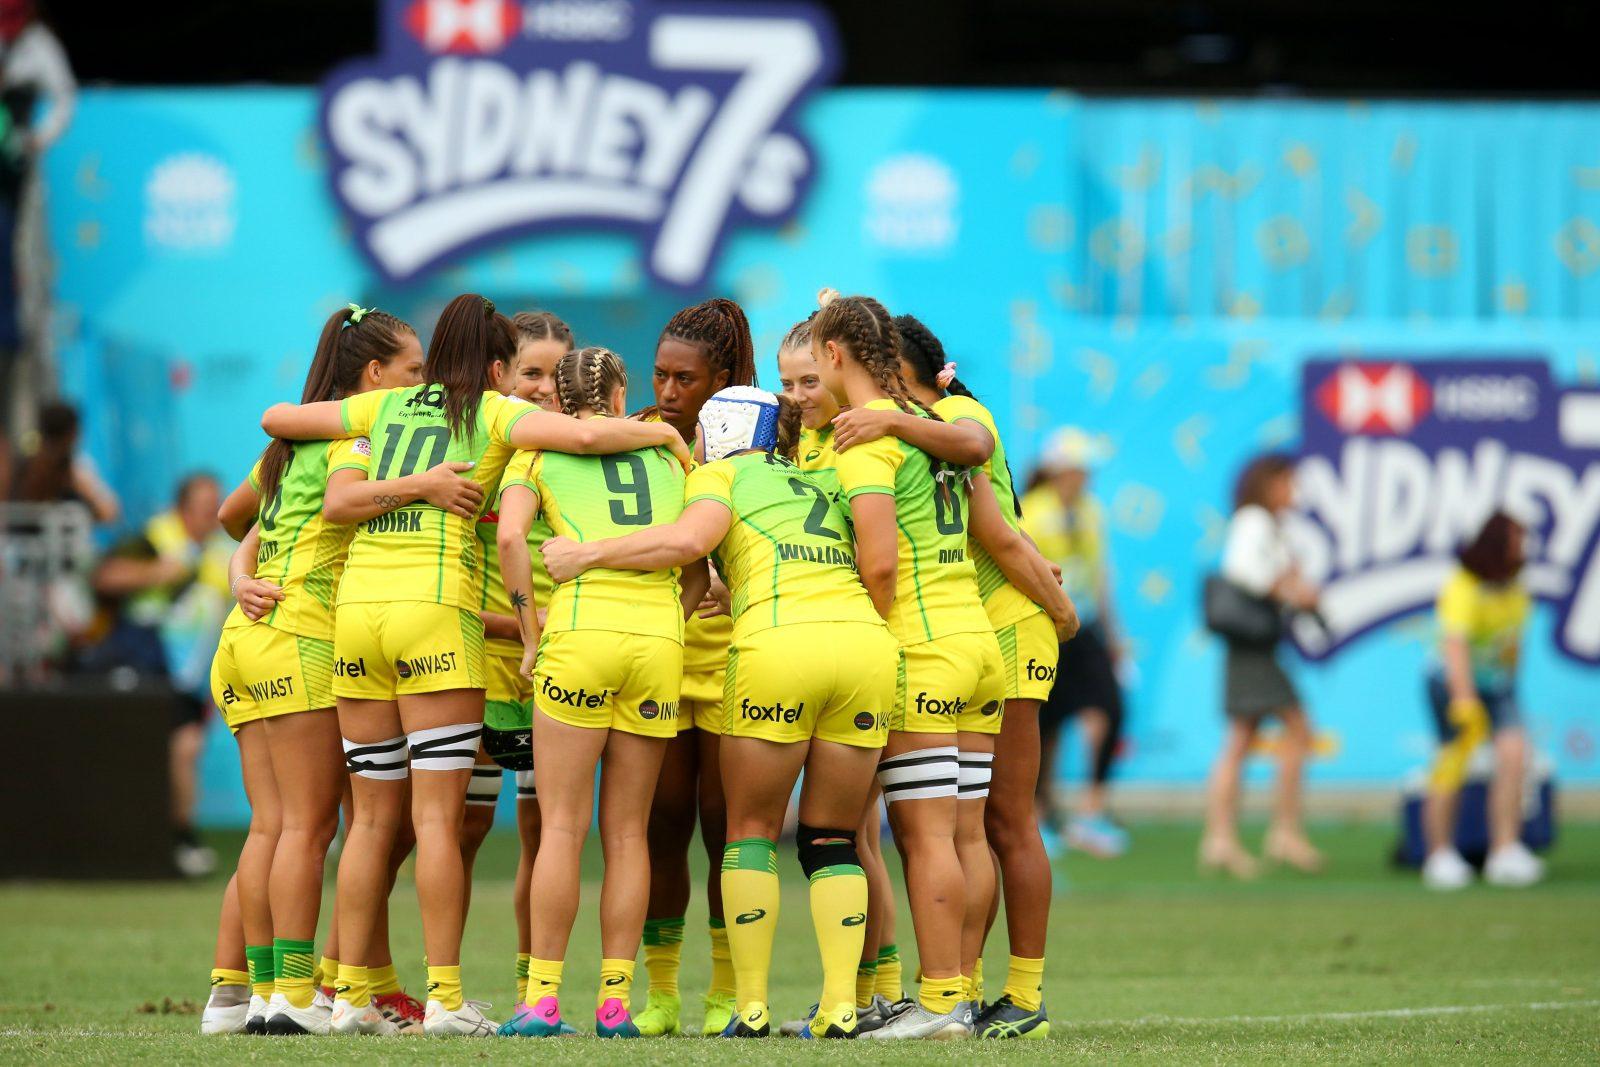 Sydney 7s Image